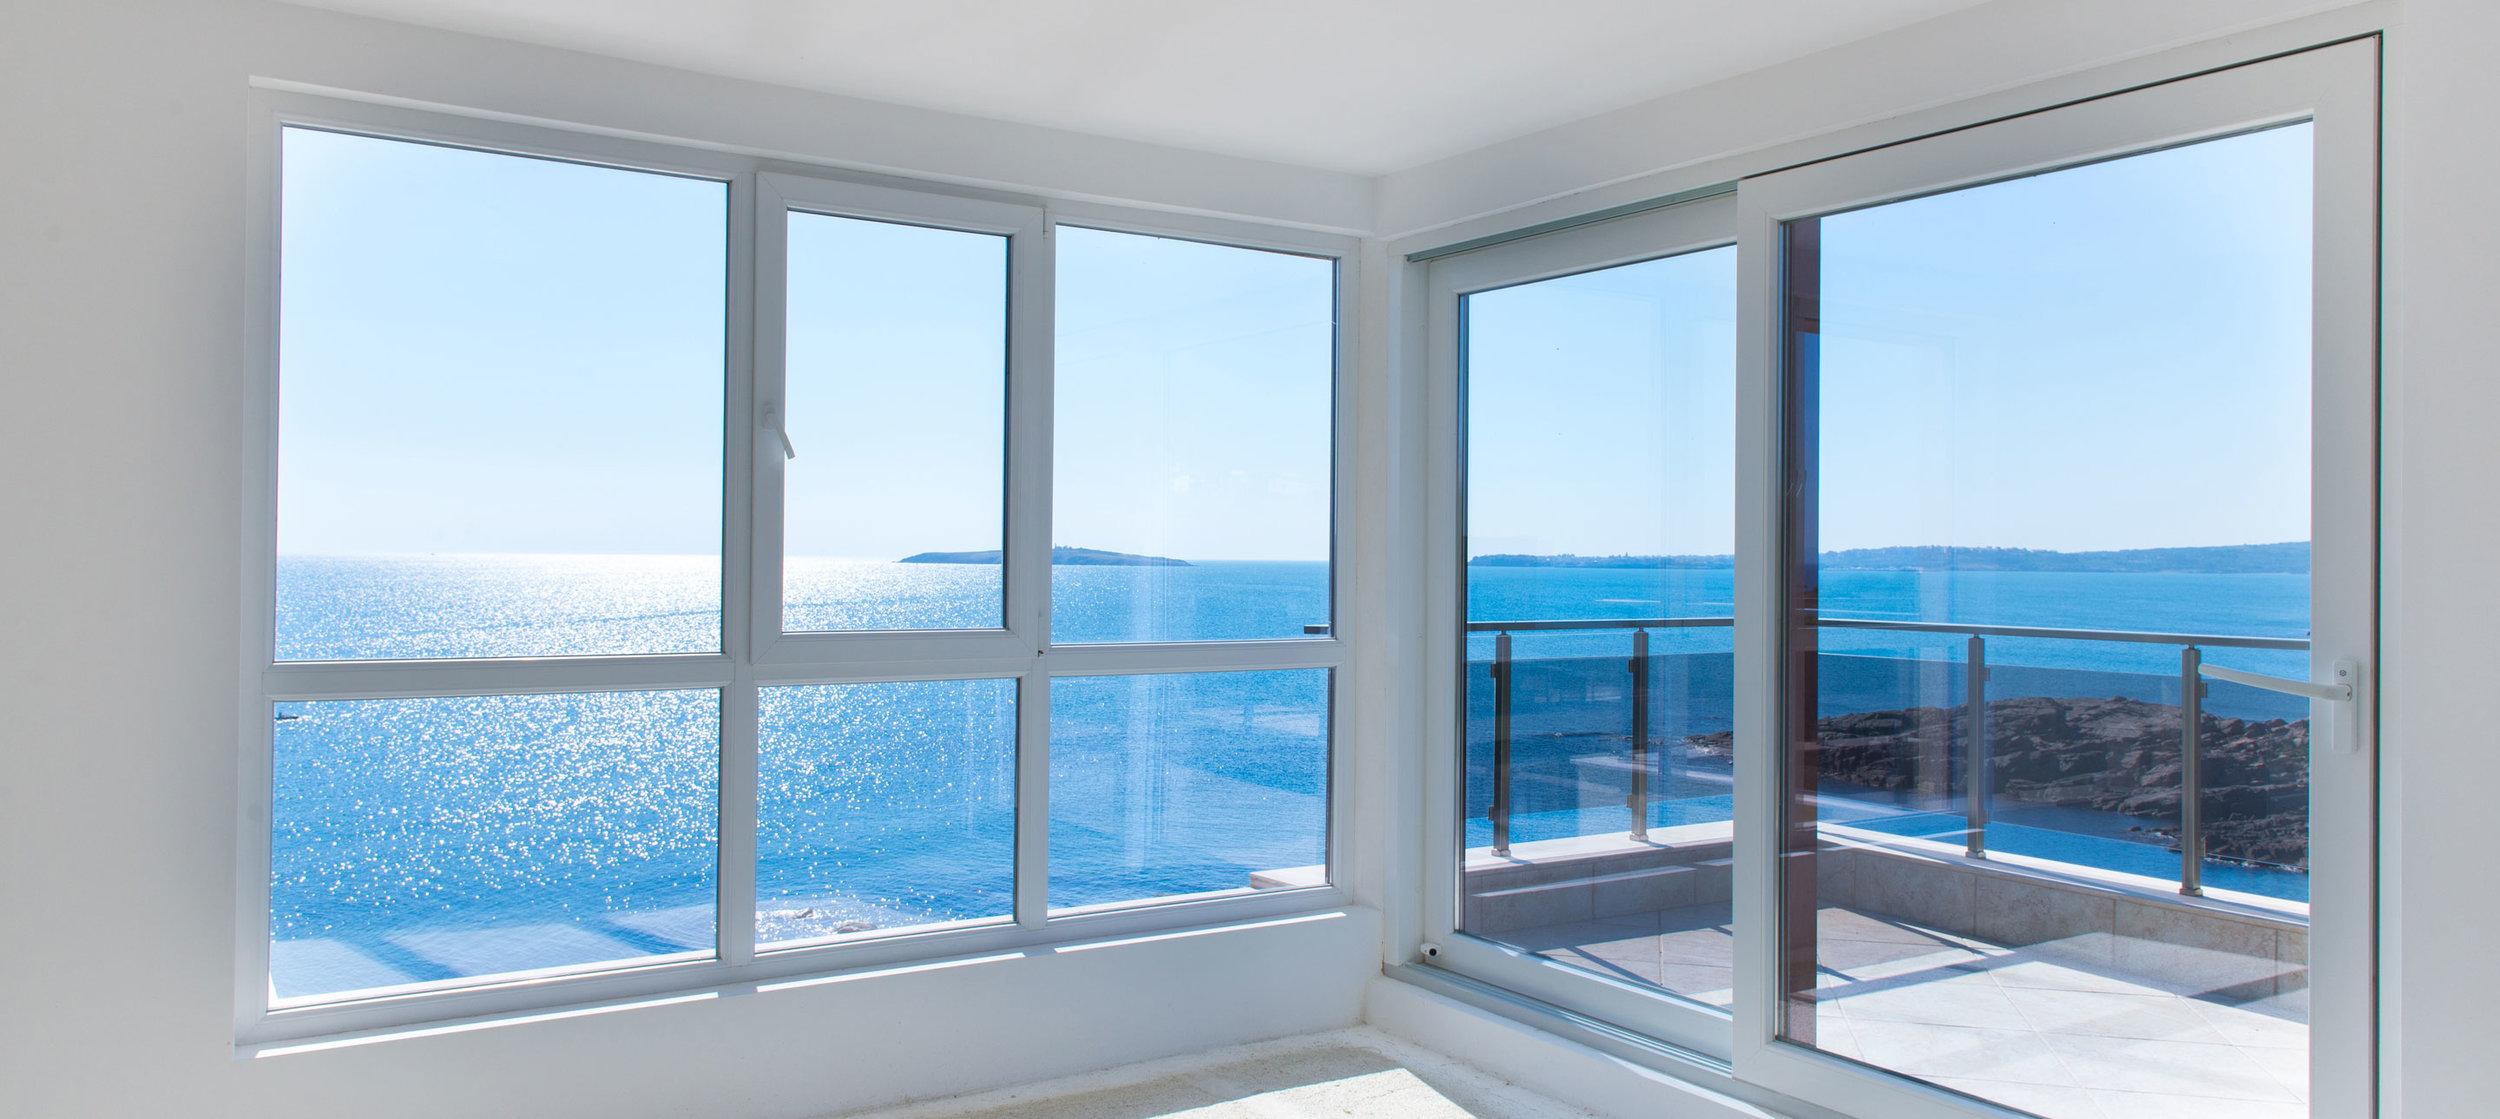 Aruba Windows and Doors